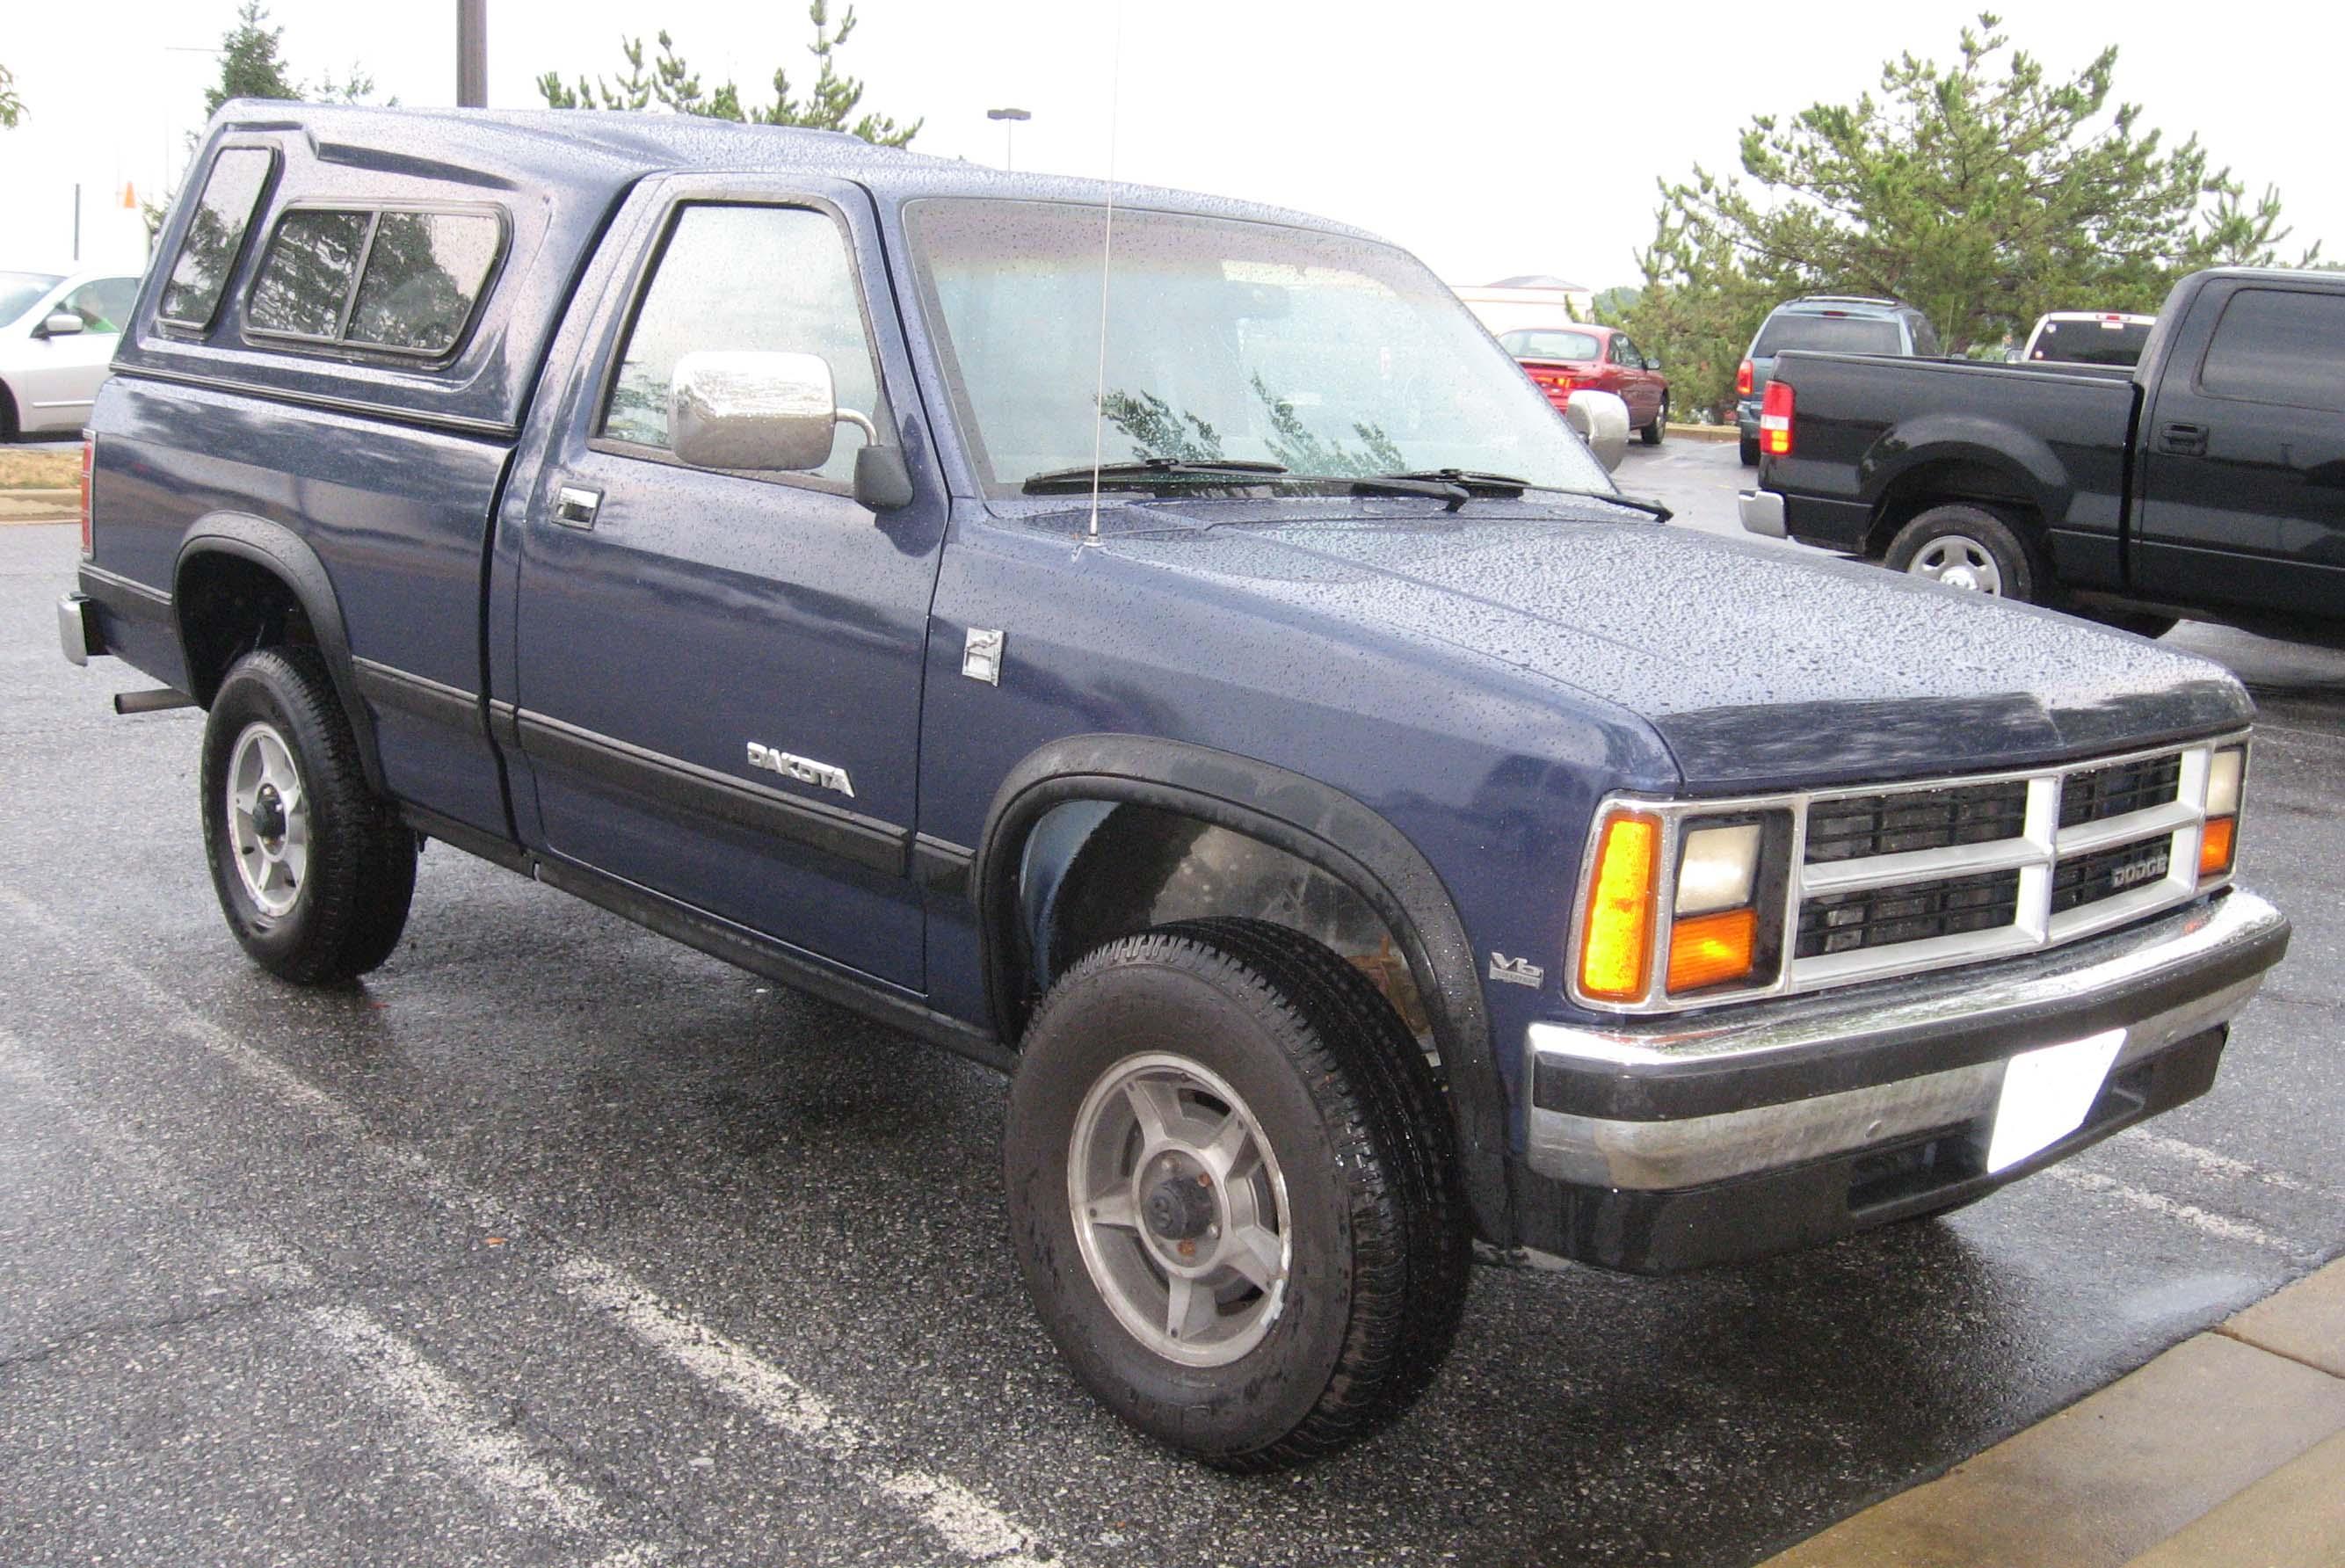 File:1987-90 Dodge Dakota.jpg - Wikimedia Commons